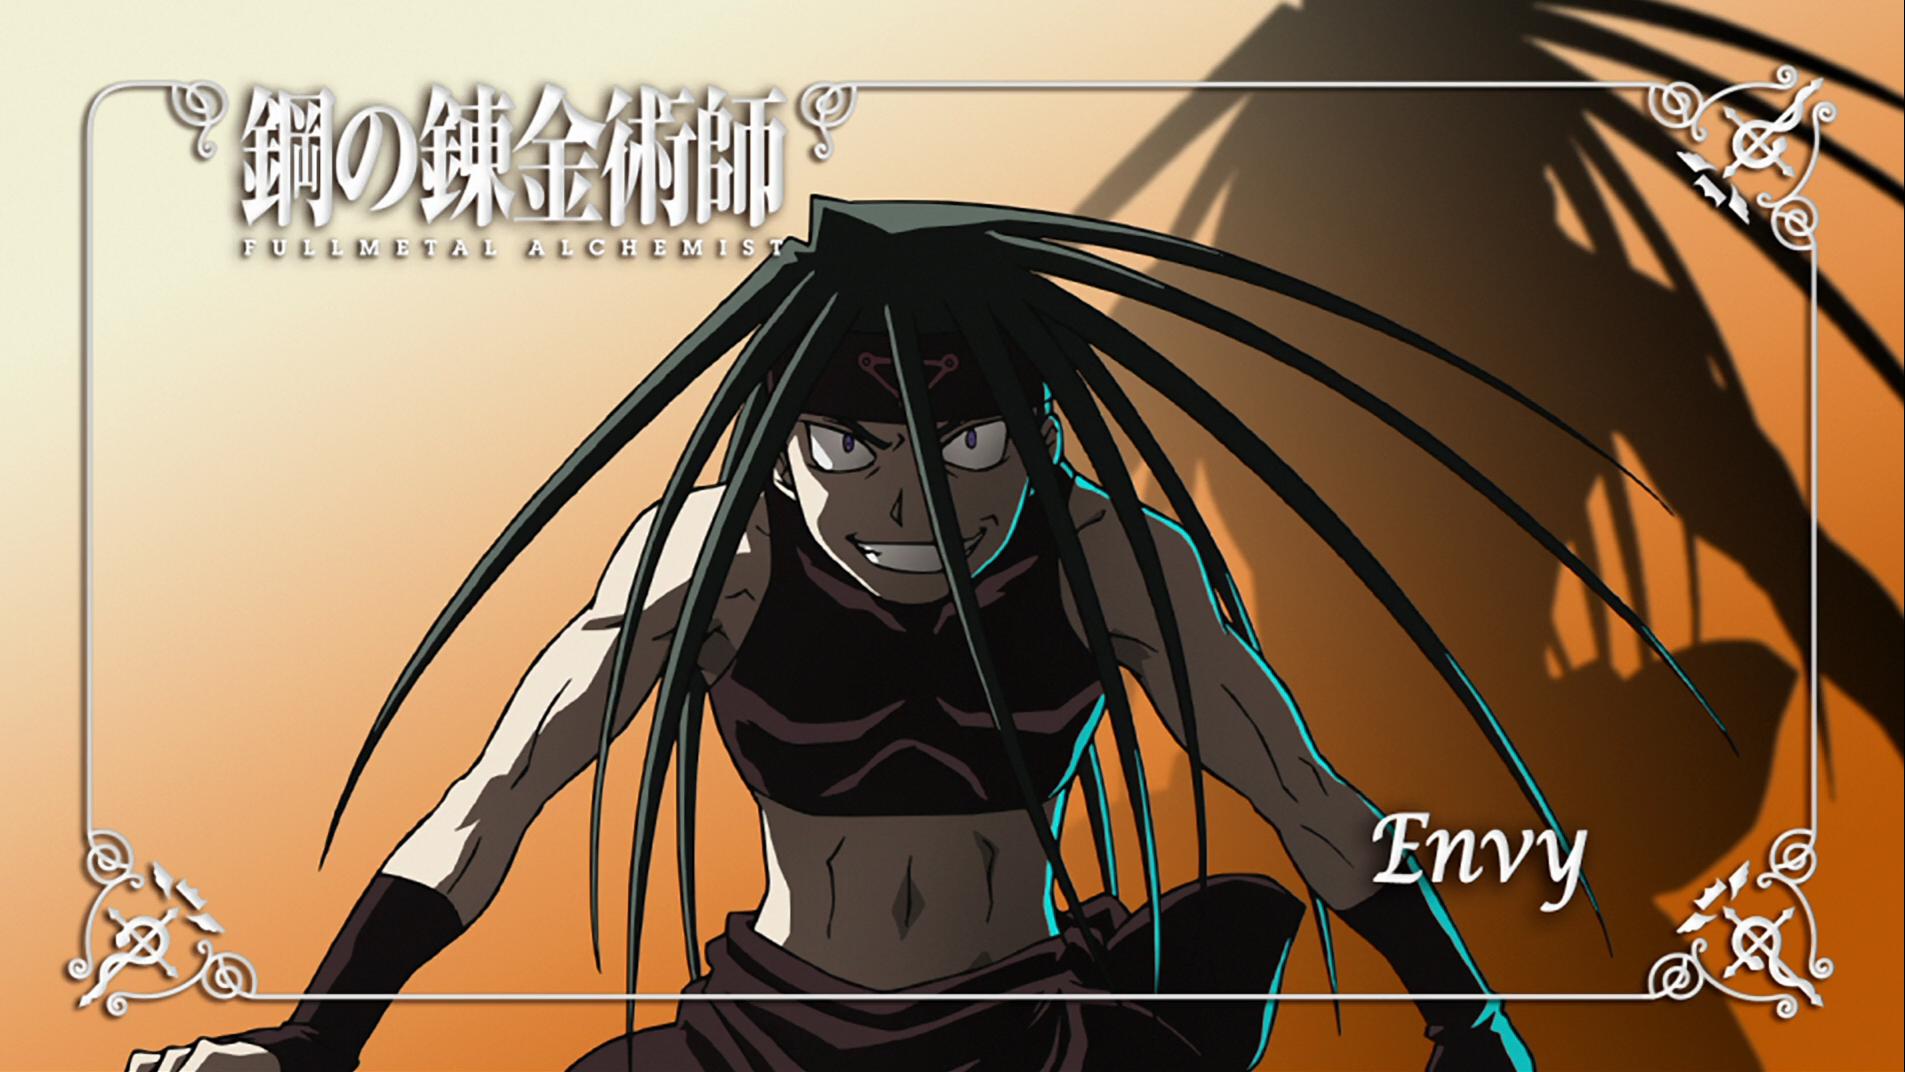 25 Envy Fullmetal Alchemist HD Wallpapers